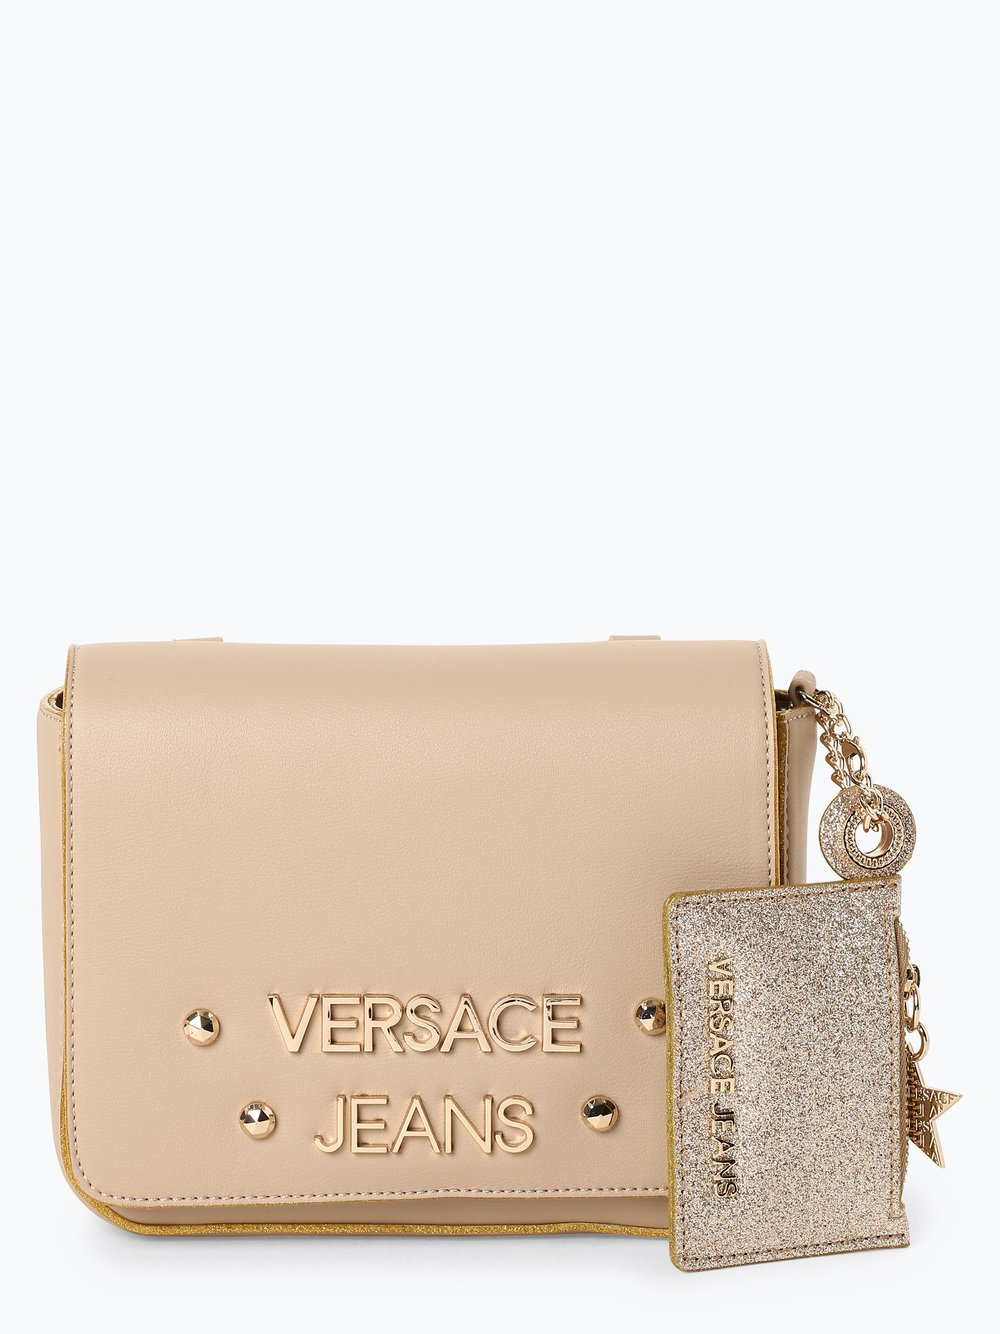 Versace  Jeans - Damska torebka na ramię, beżowy